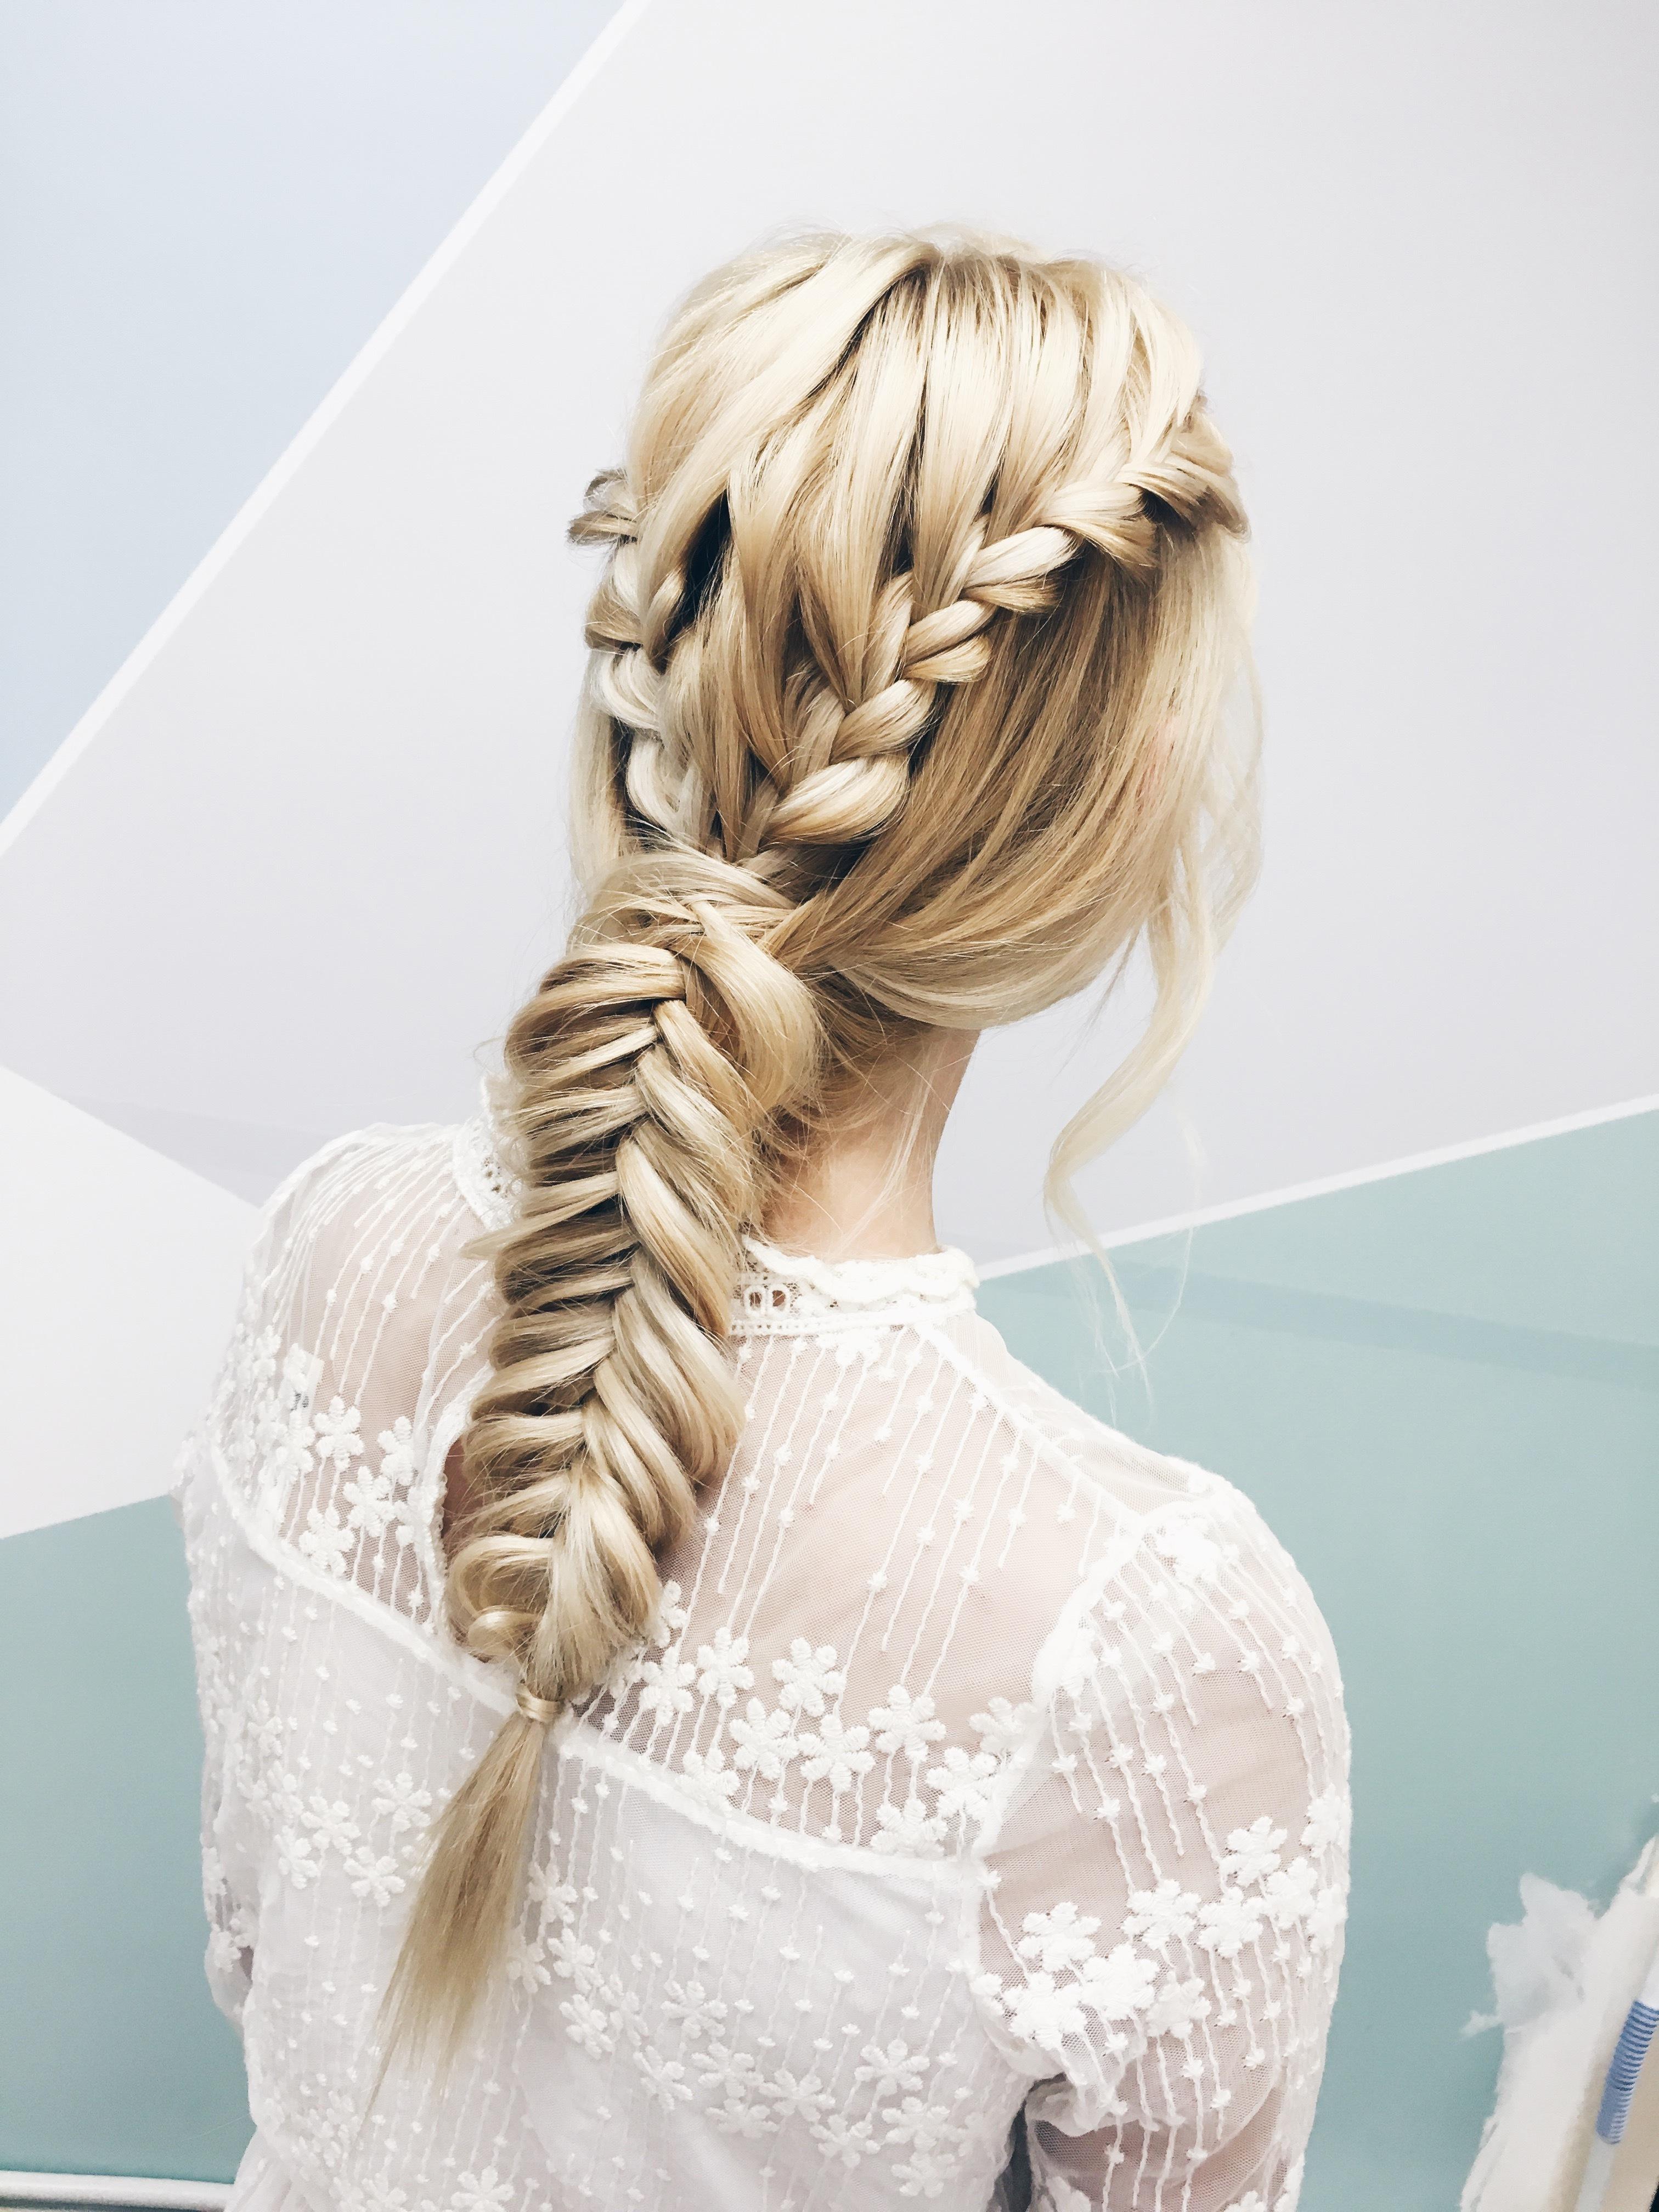 Blonde hair color fishtail braids